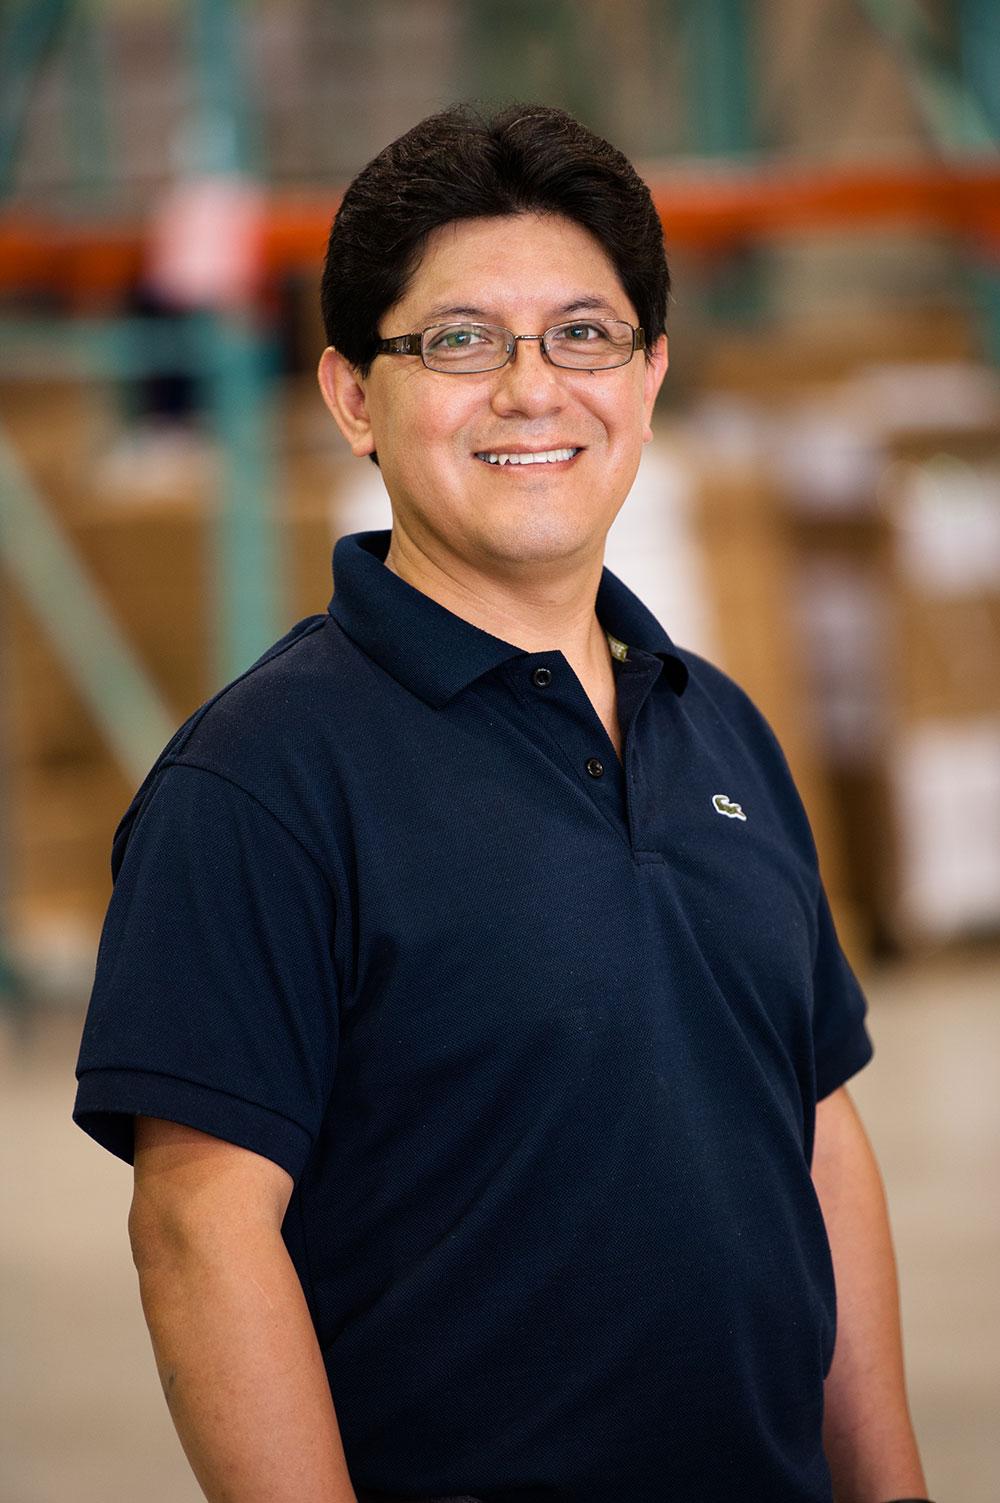 Marketing Kitchen direct mail expert Marcelo Paredes